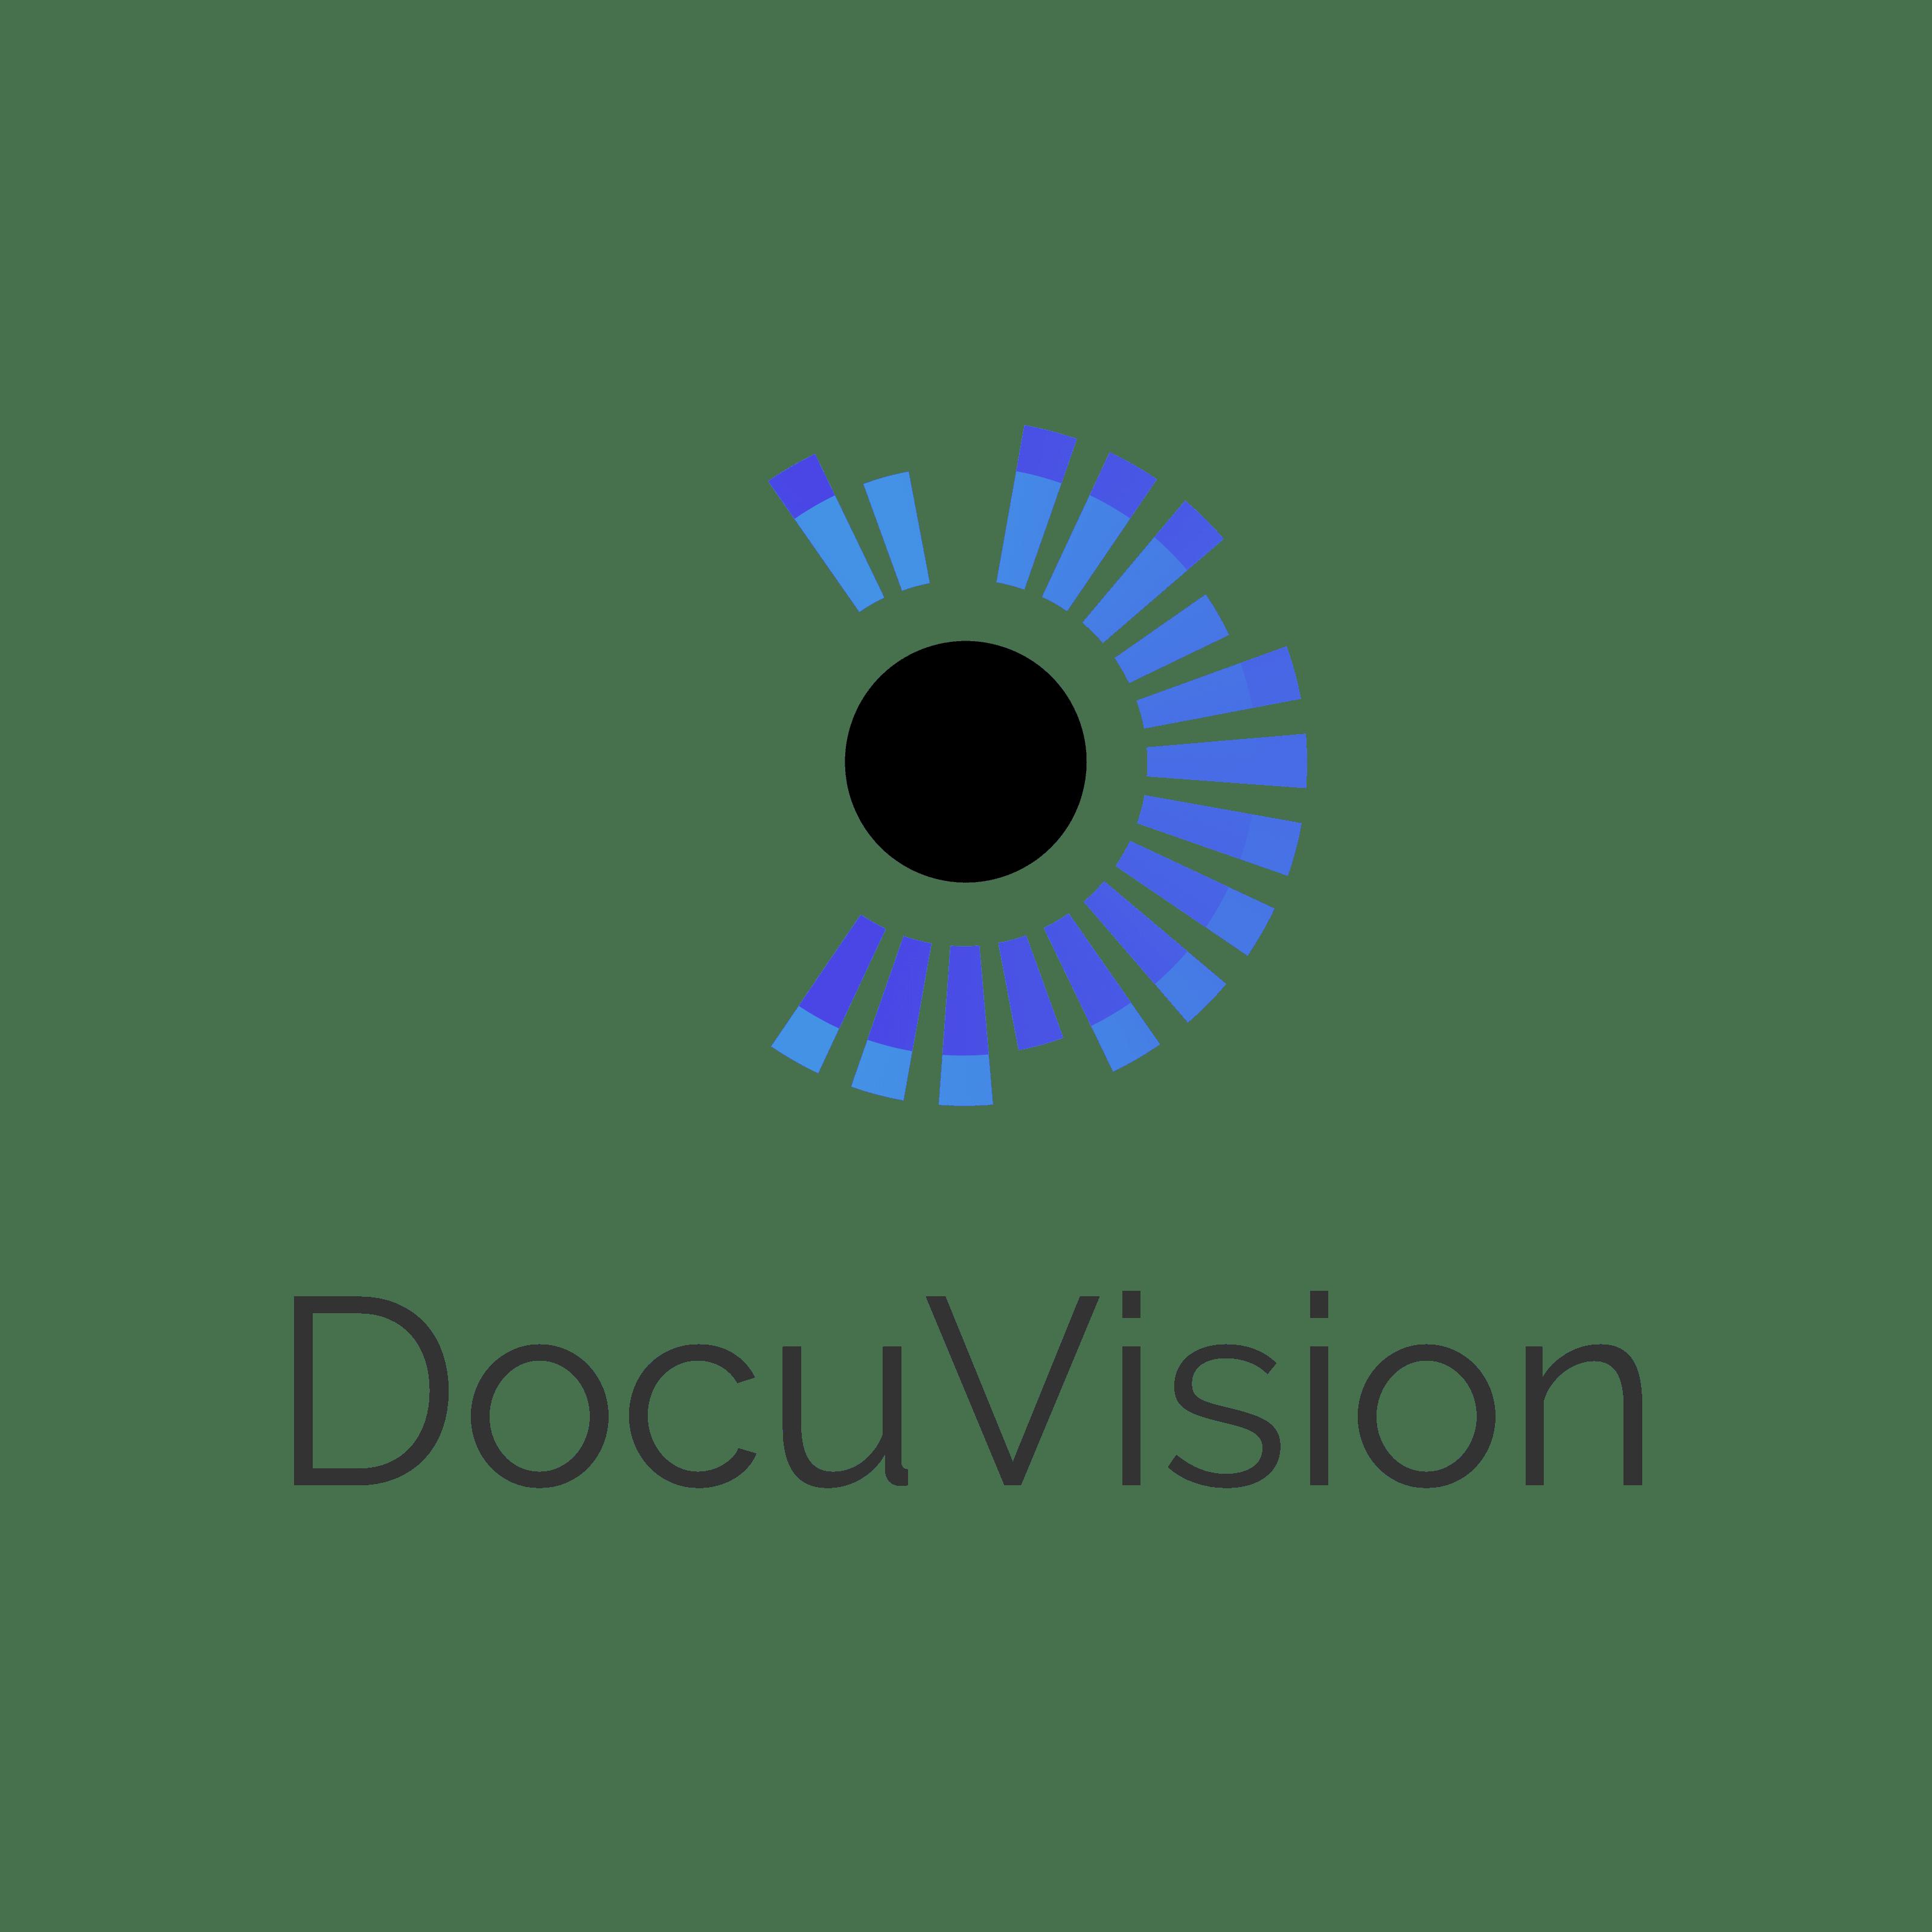 Docuvision